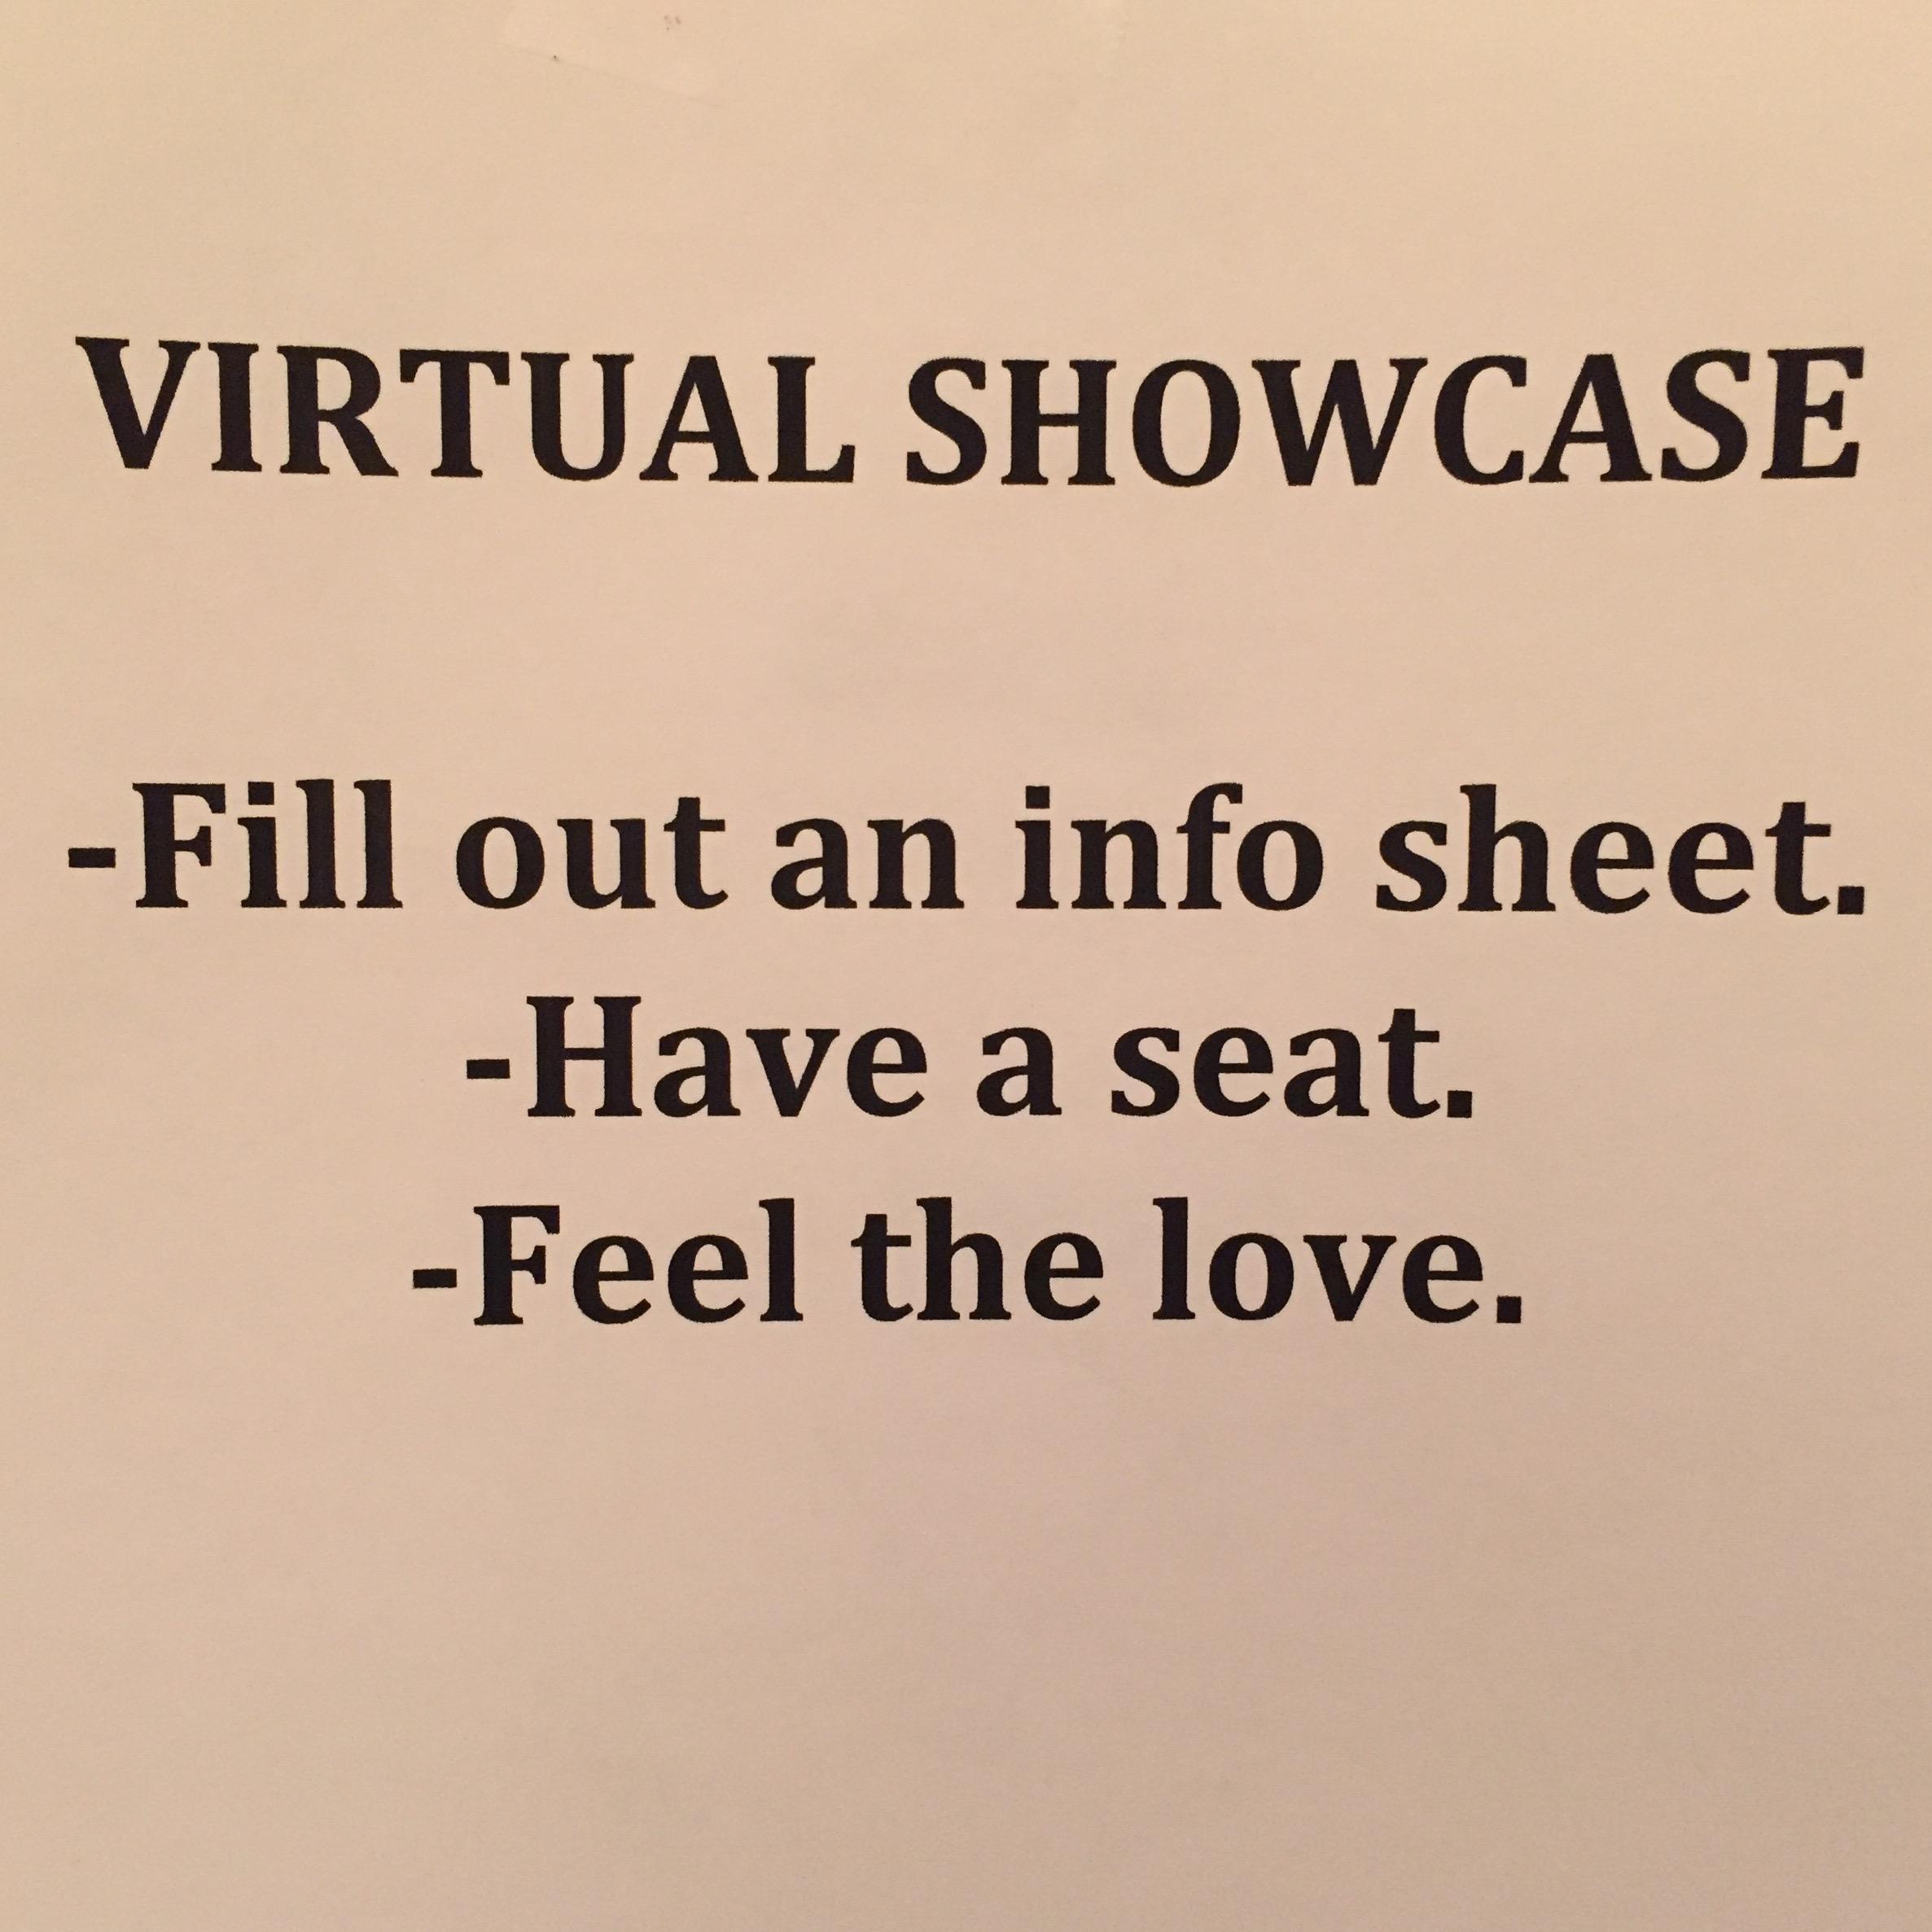 Virtual Showcase Sign